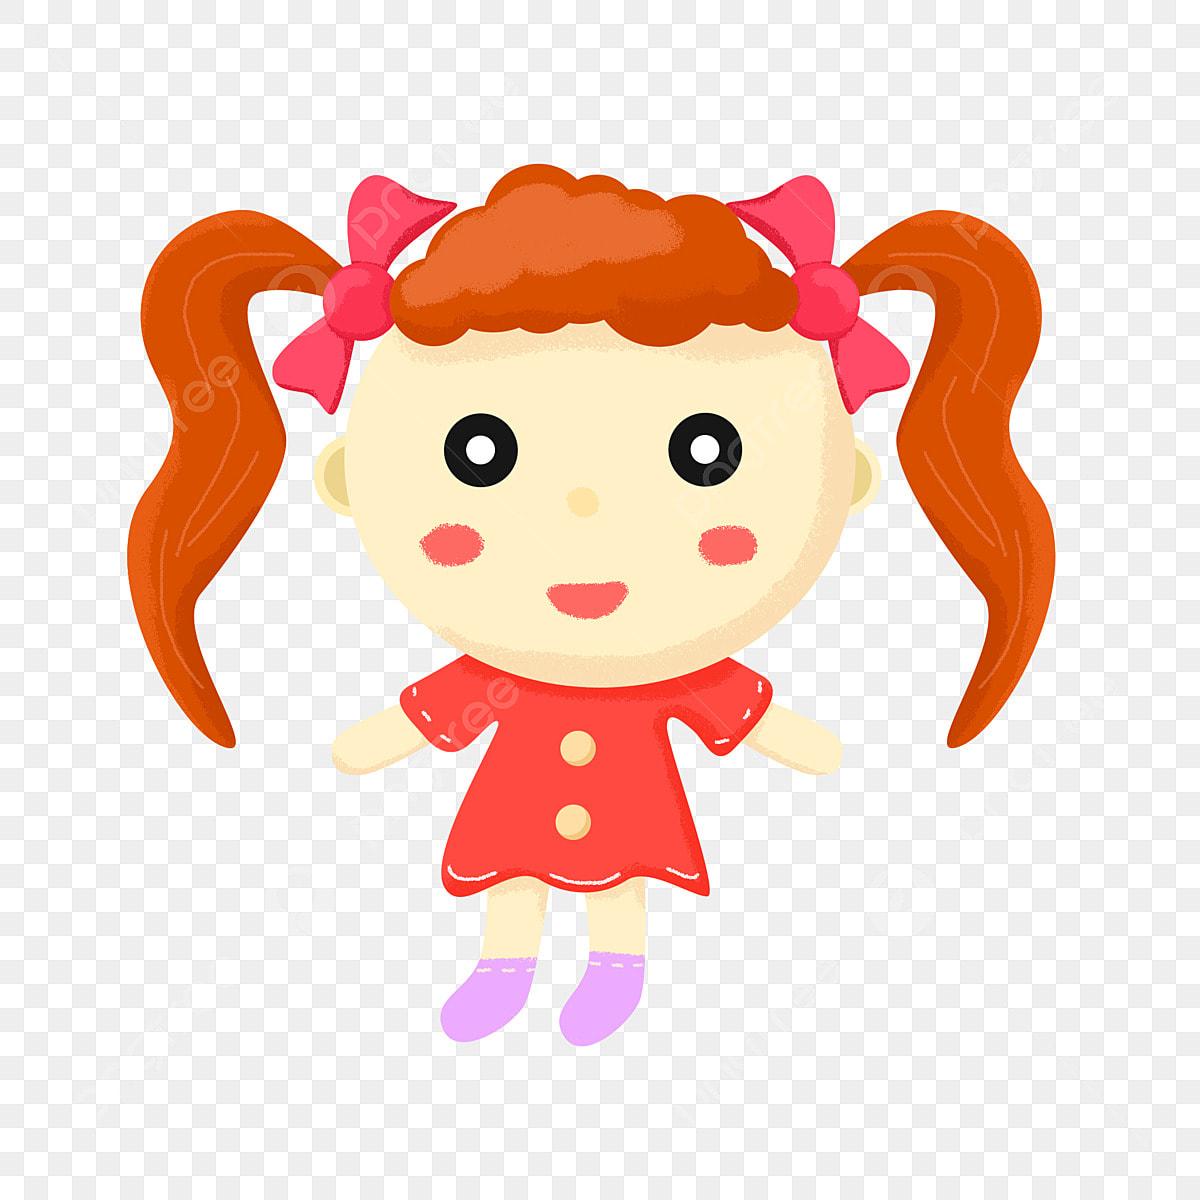 Boneca Menina Png Images Vetores E Arquivos Psd Download